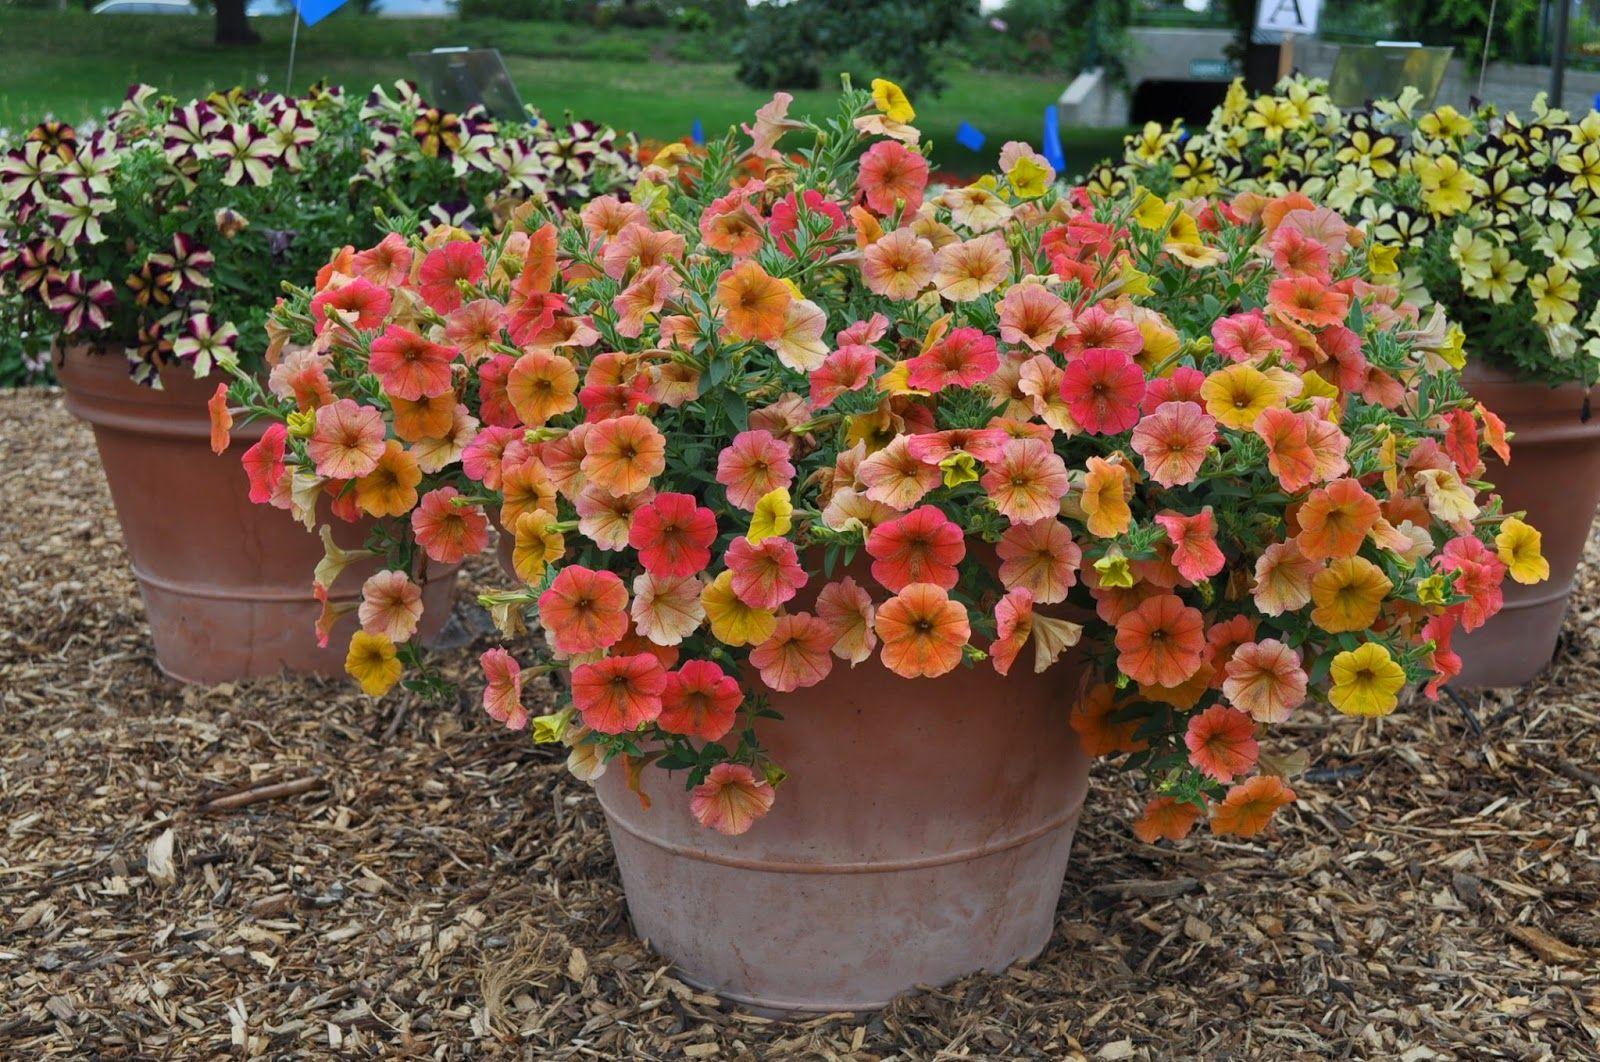 Petunia 'Cascadias Indian Summer' is a staff favorite